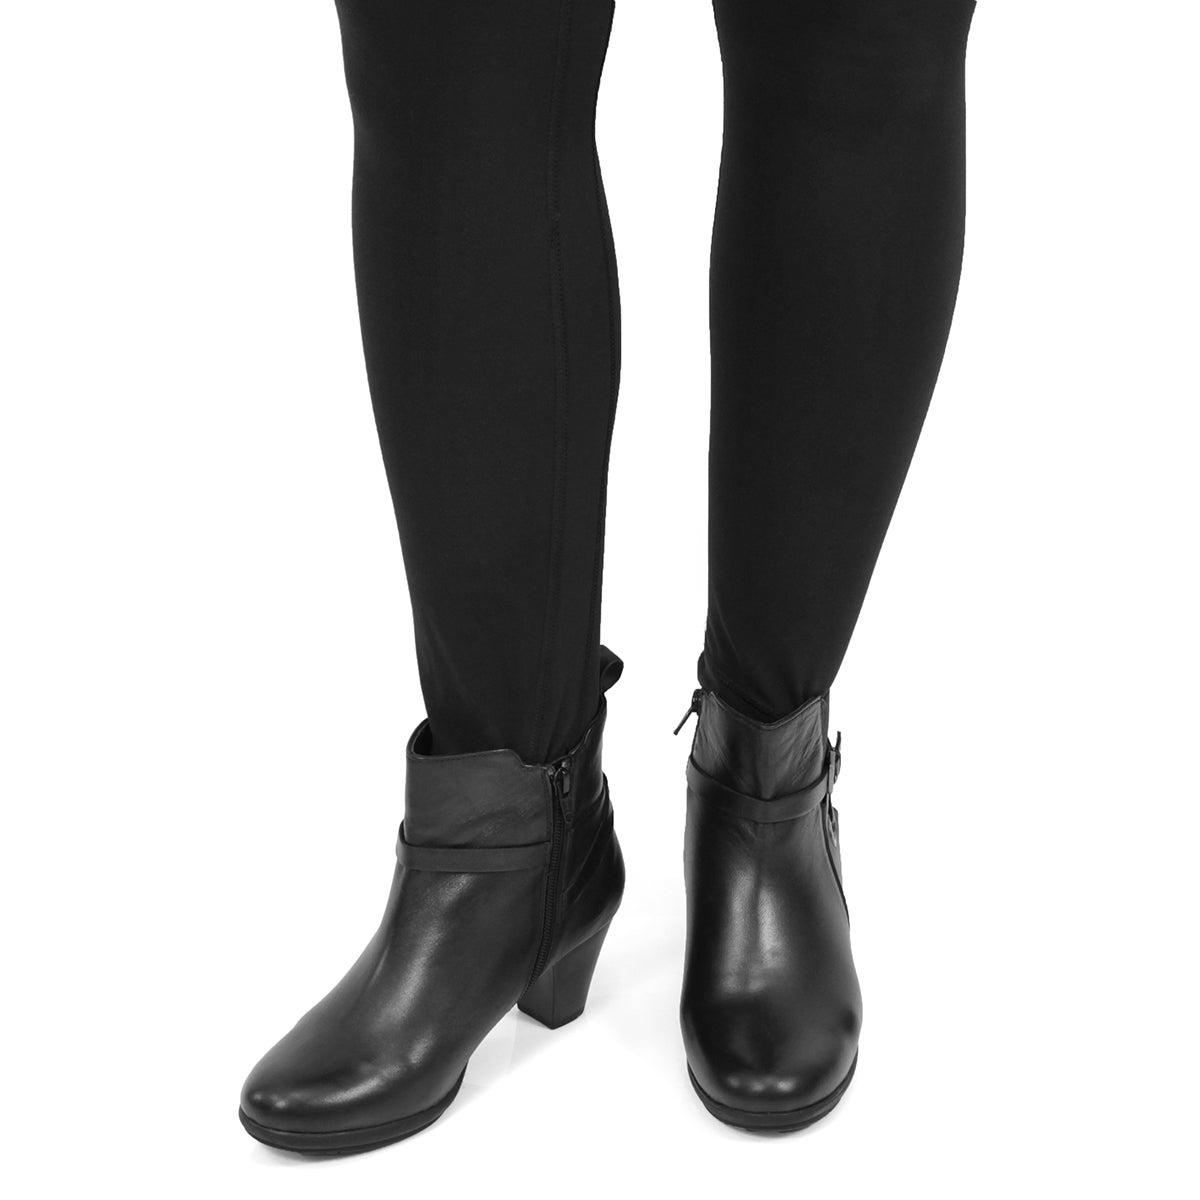 Lds Delicia black dress bootie